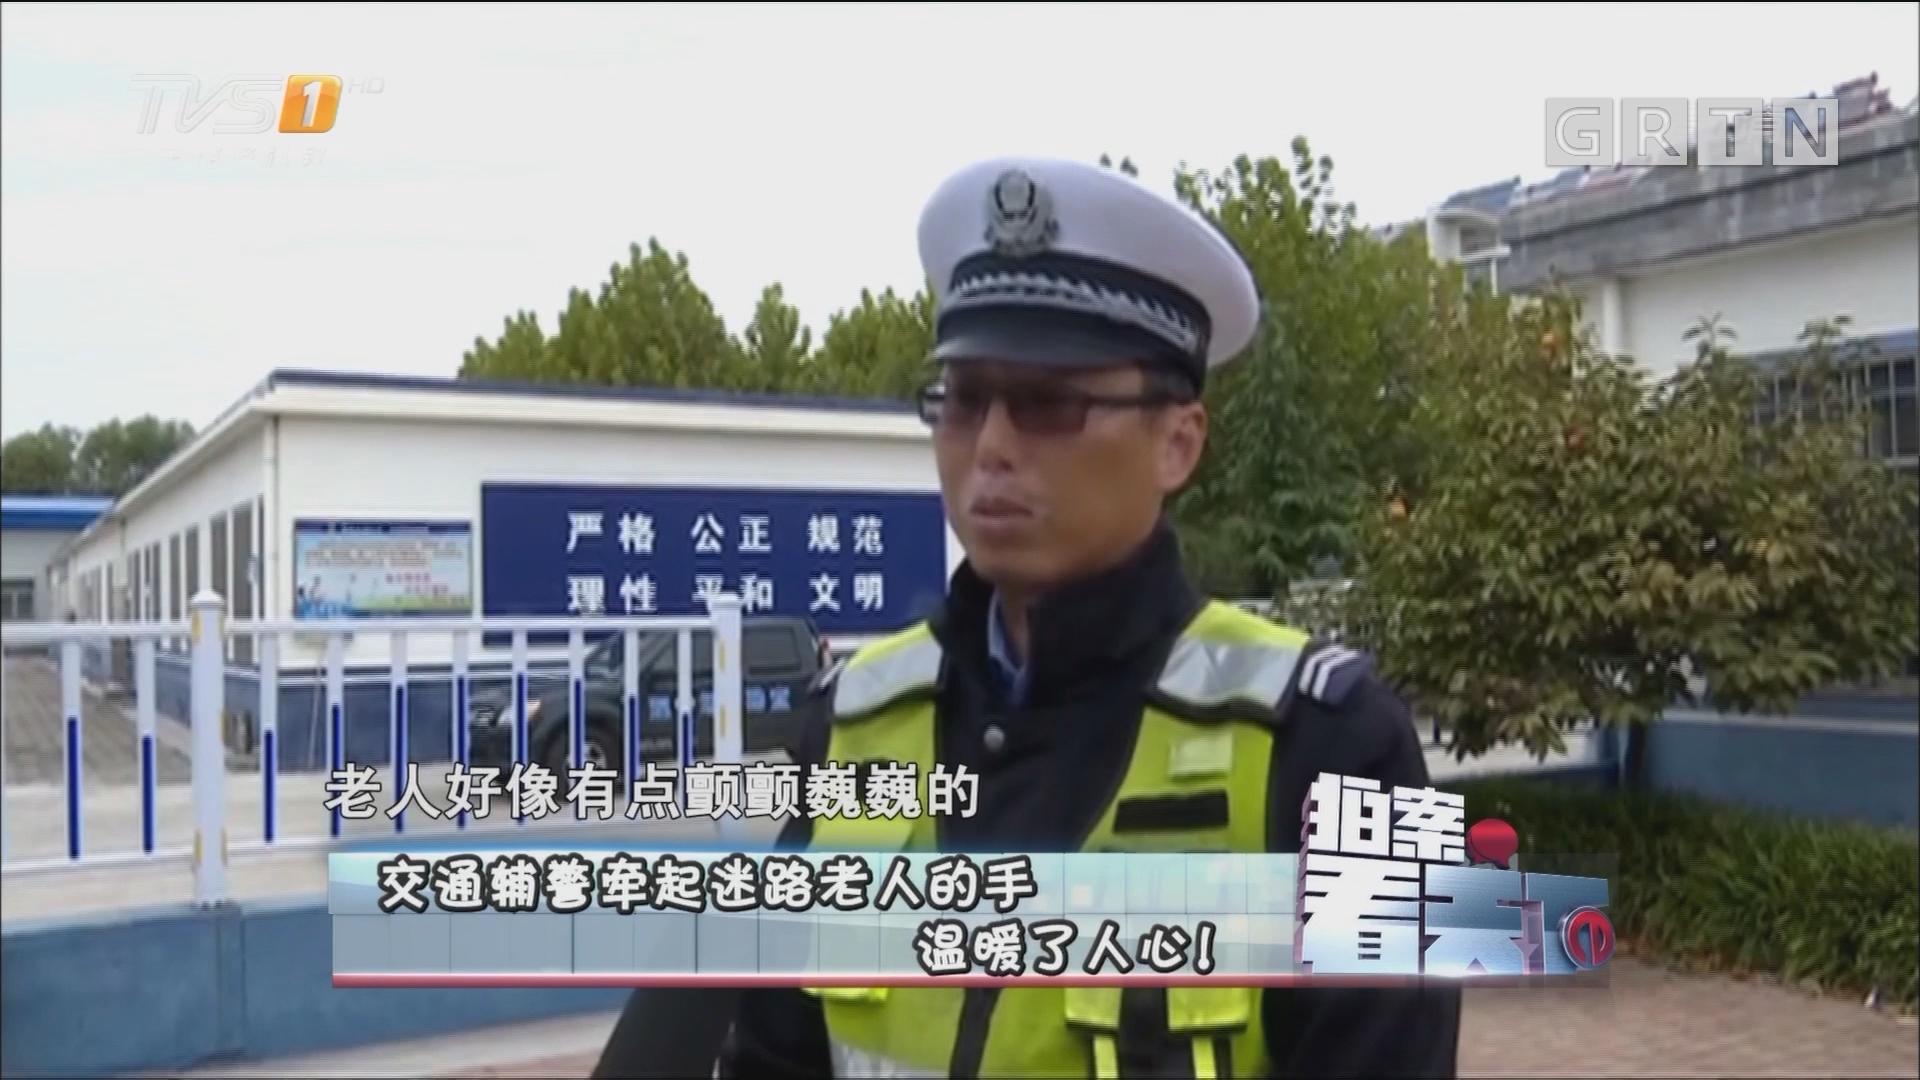 [HD][2017-10-11]拍案看天下:交通辅警牵起迷路老人的手 温暖了人心!